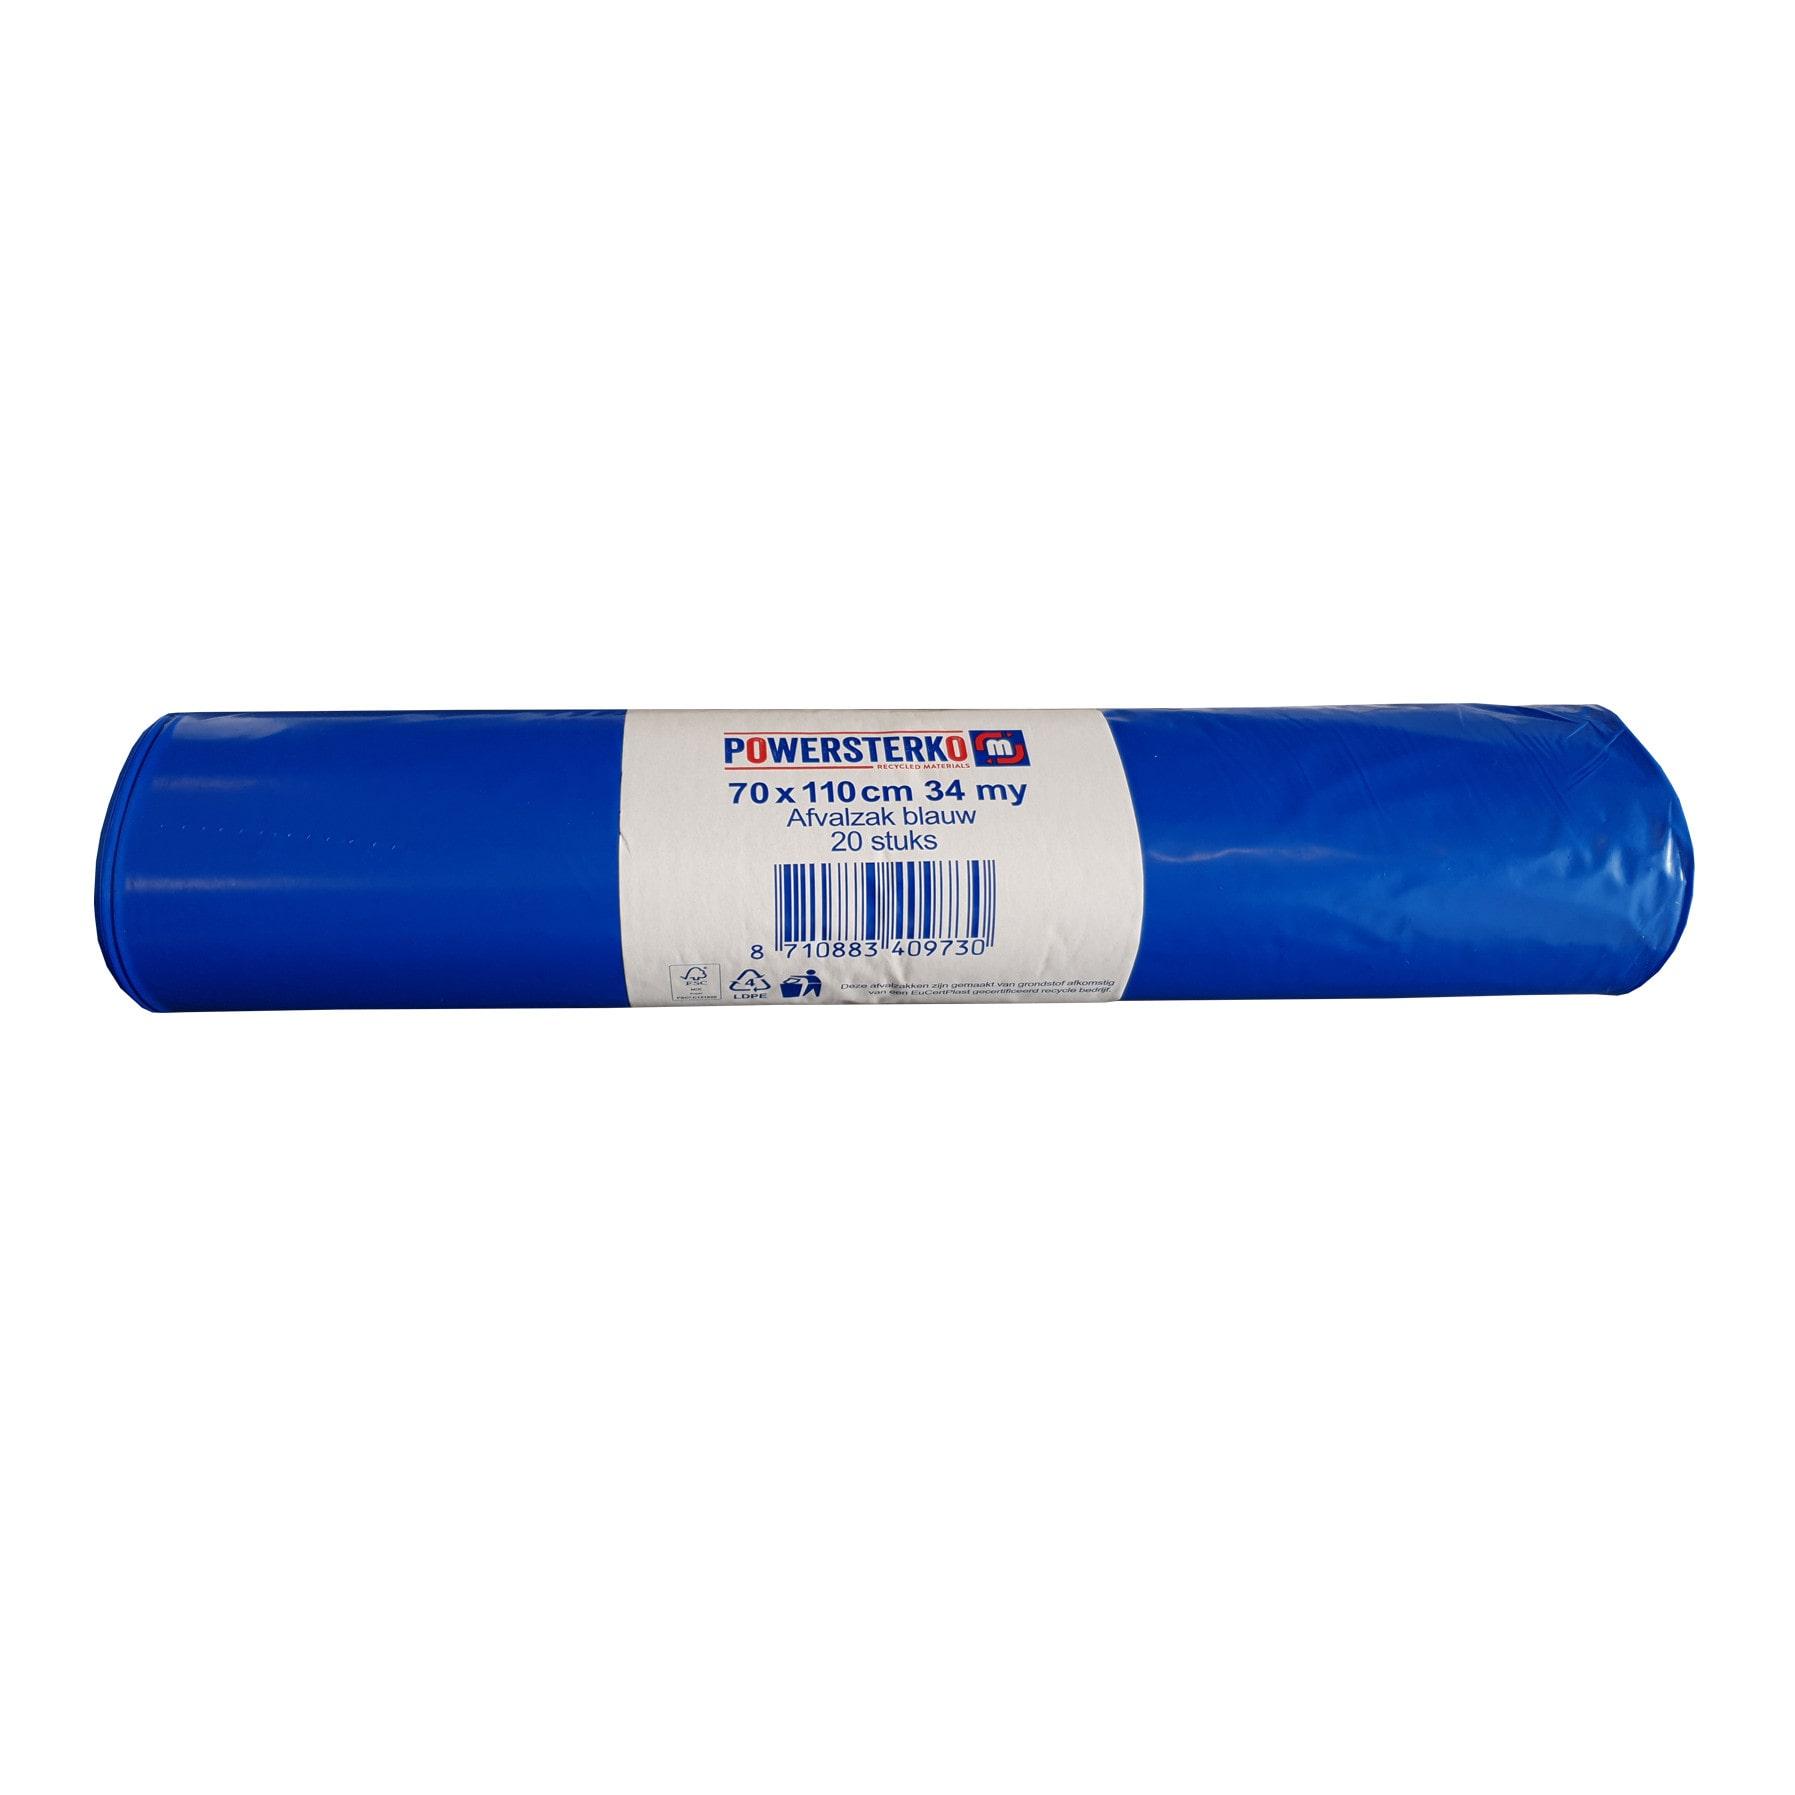 Powersterko afvalzak blauw 70 x 110 cm 34 MY 10 rollen x 20 zakken